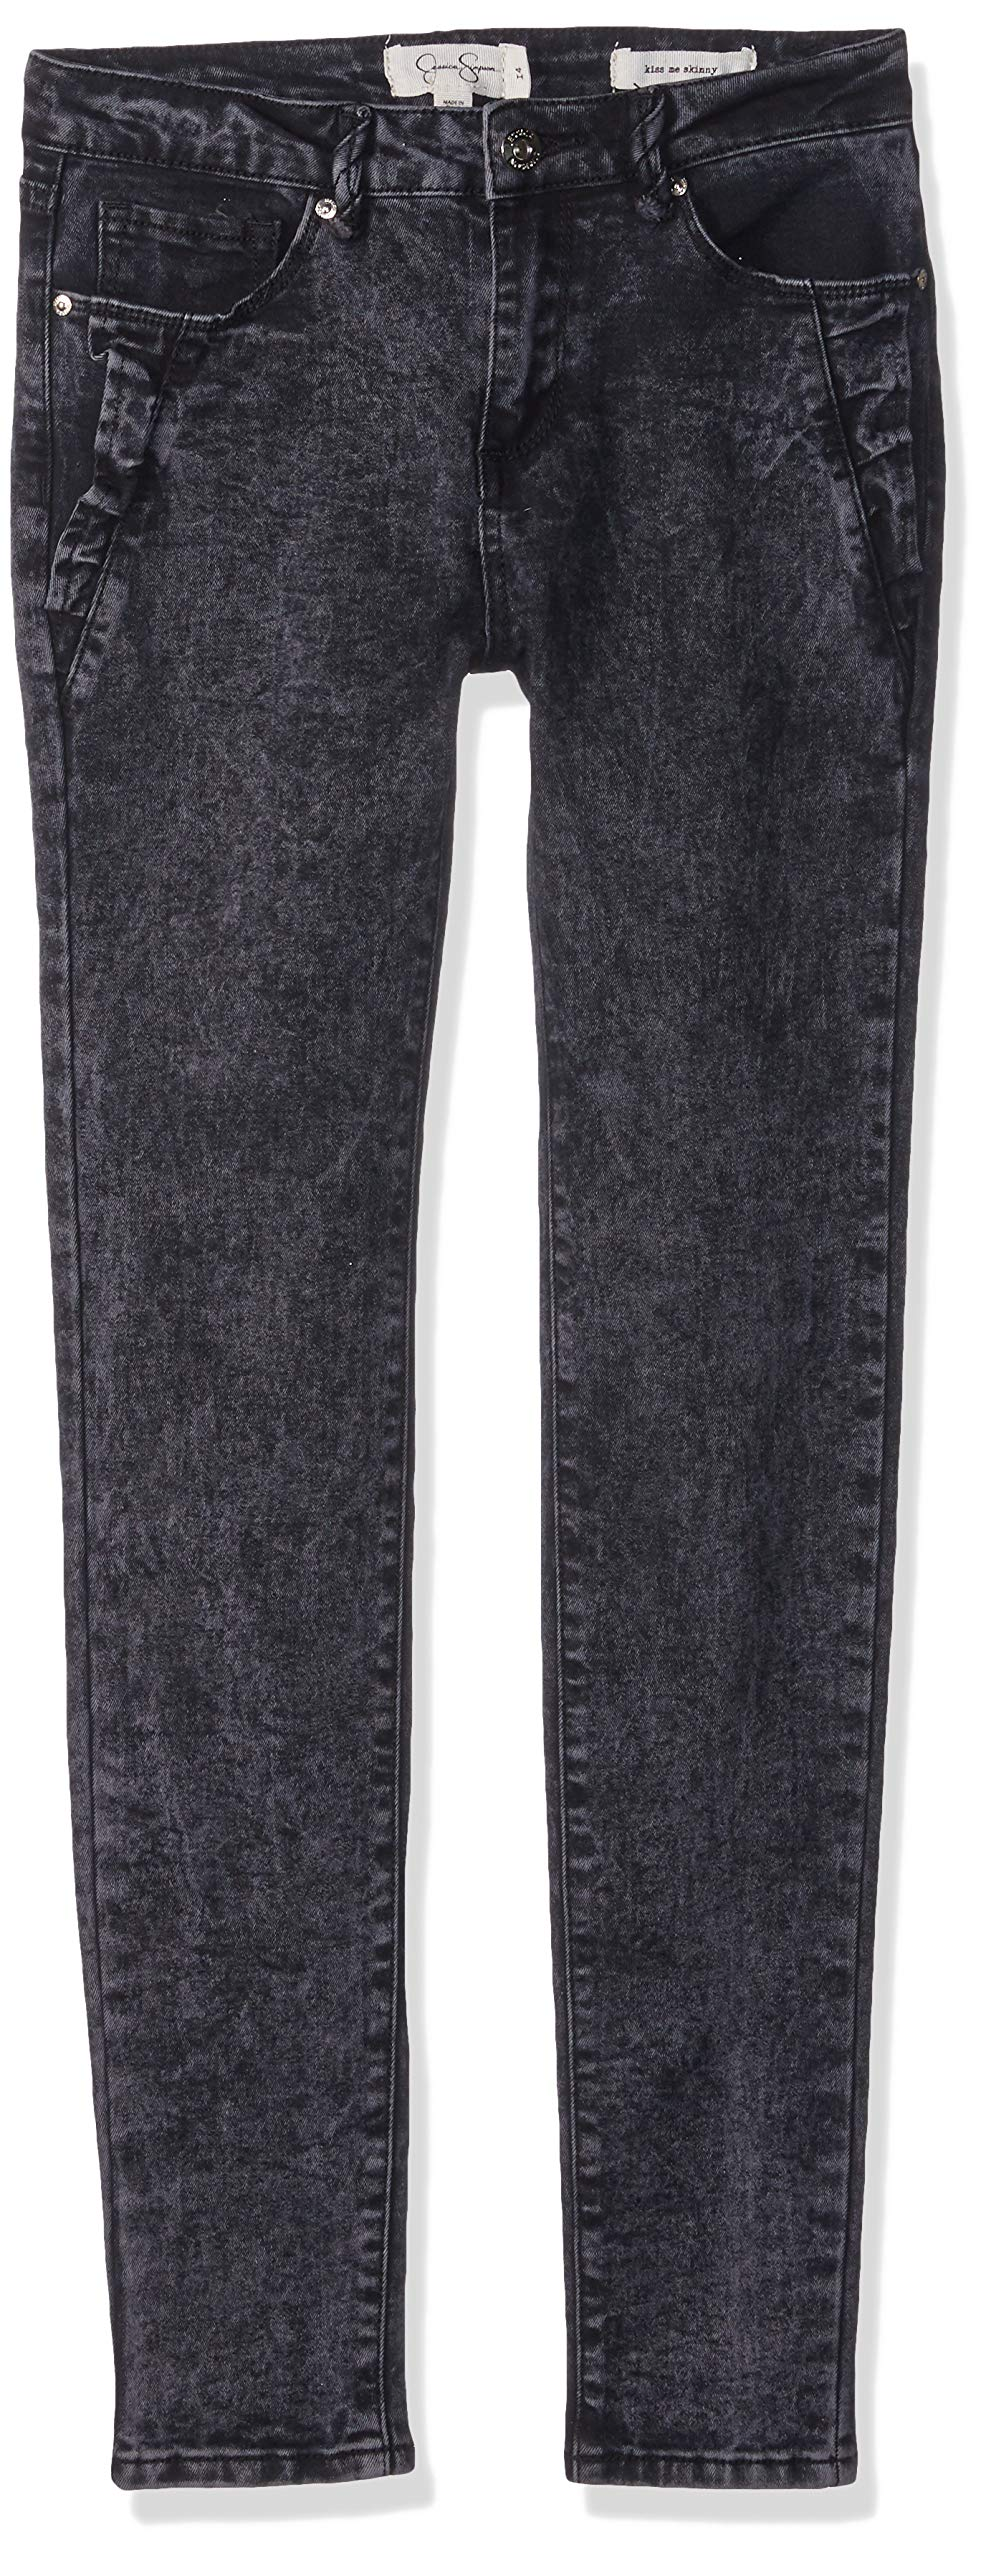 Jessica Simpson Big Girls' Black Wash Skinny Jean, Washed Black Wash, 14